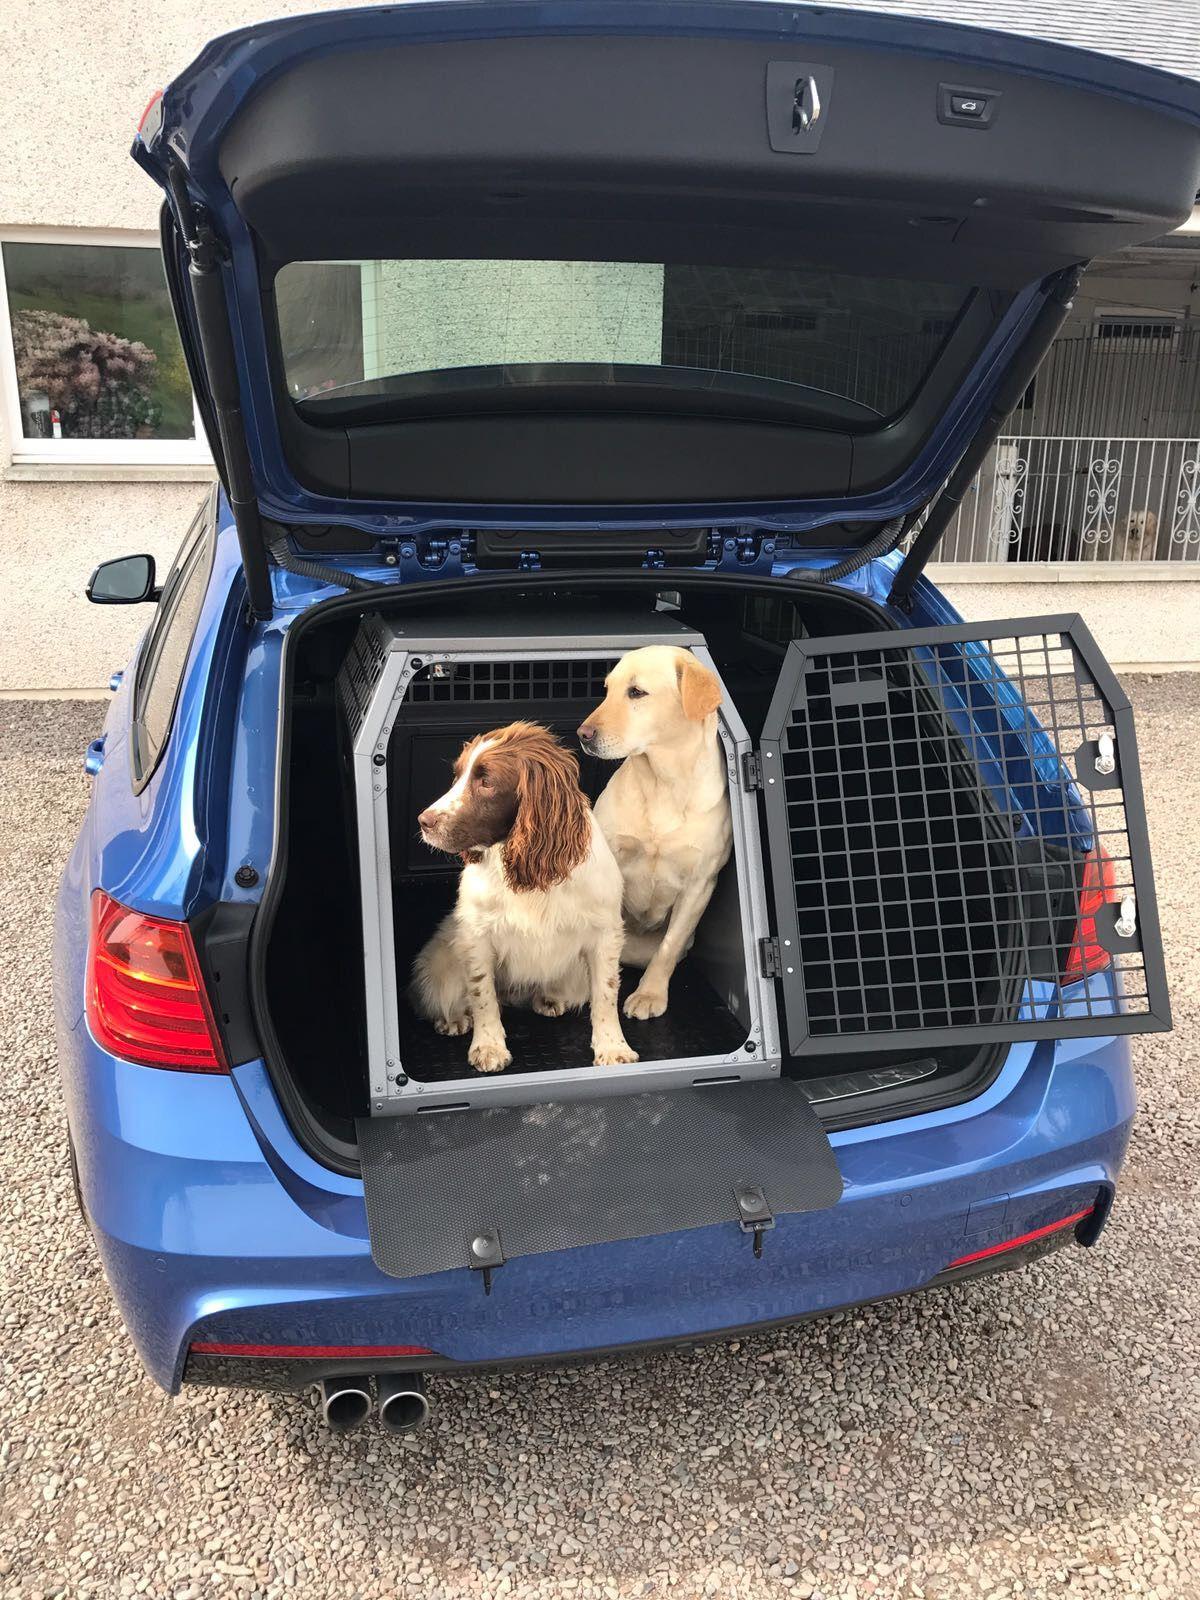 Transk9 Dog Box Safety B23 Bmw 3 Series Touring Labrador Spaniel Transport Safely Dogs Dog Box Dog Friends